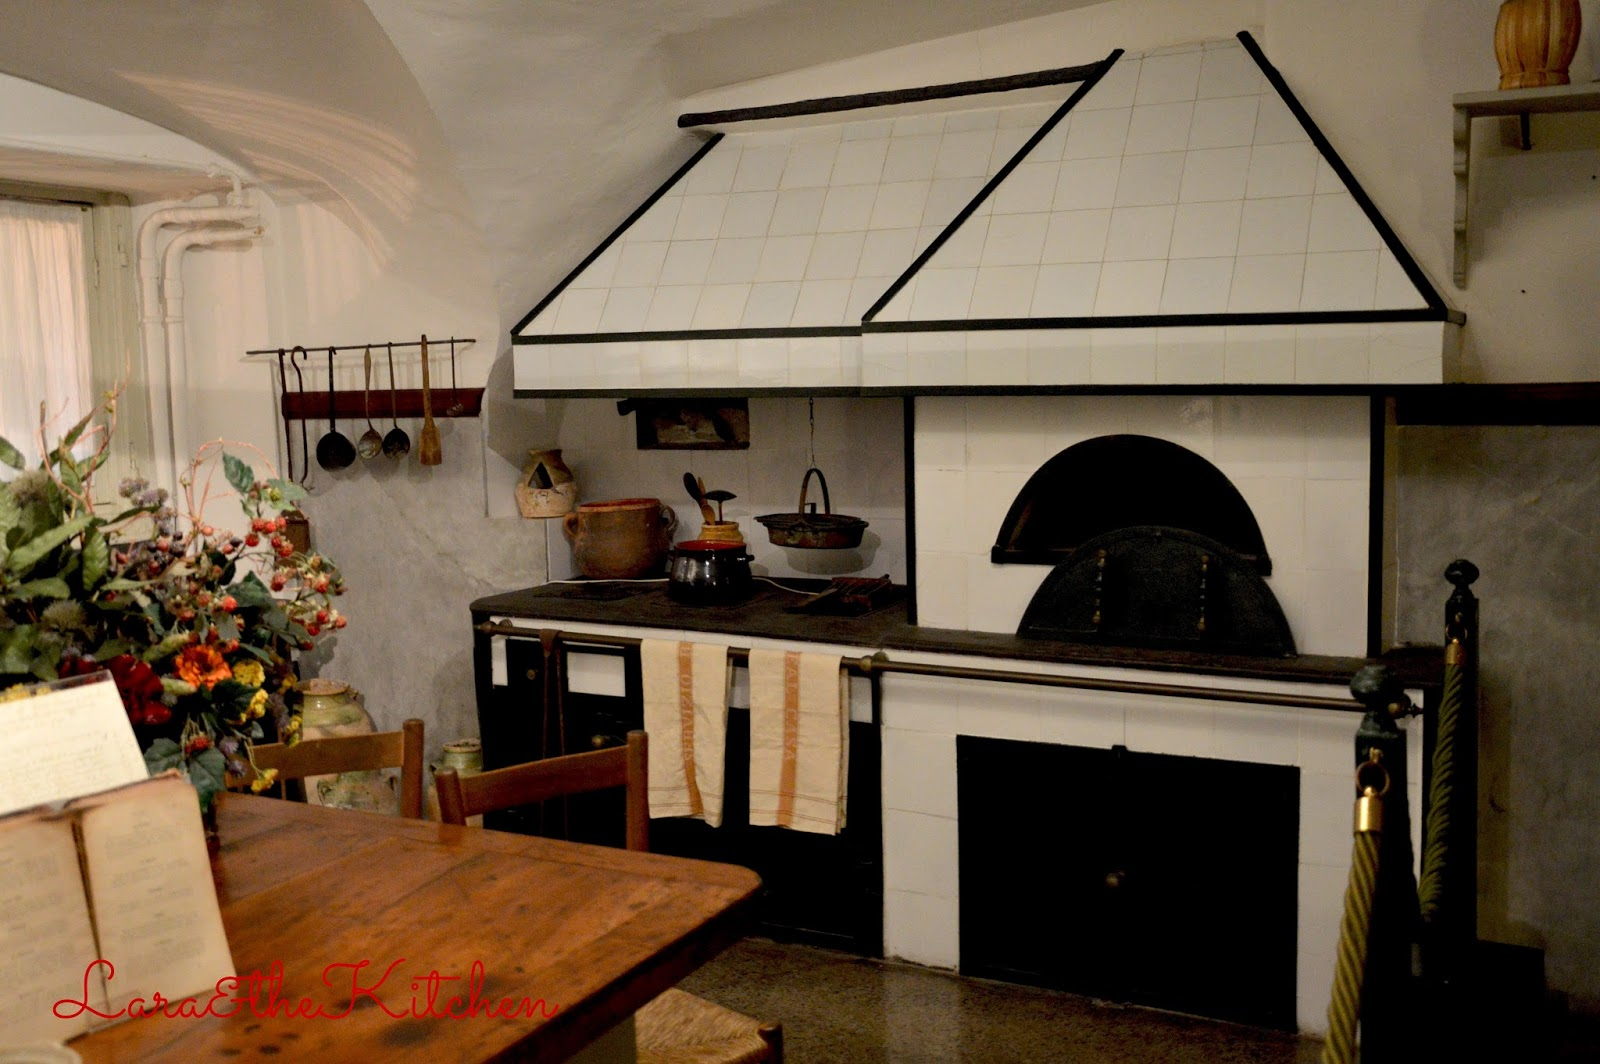 Cucine Antiche. Excellent Best La Cucina Economica Milano Gallery Us ...